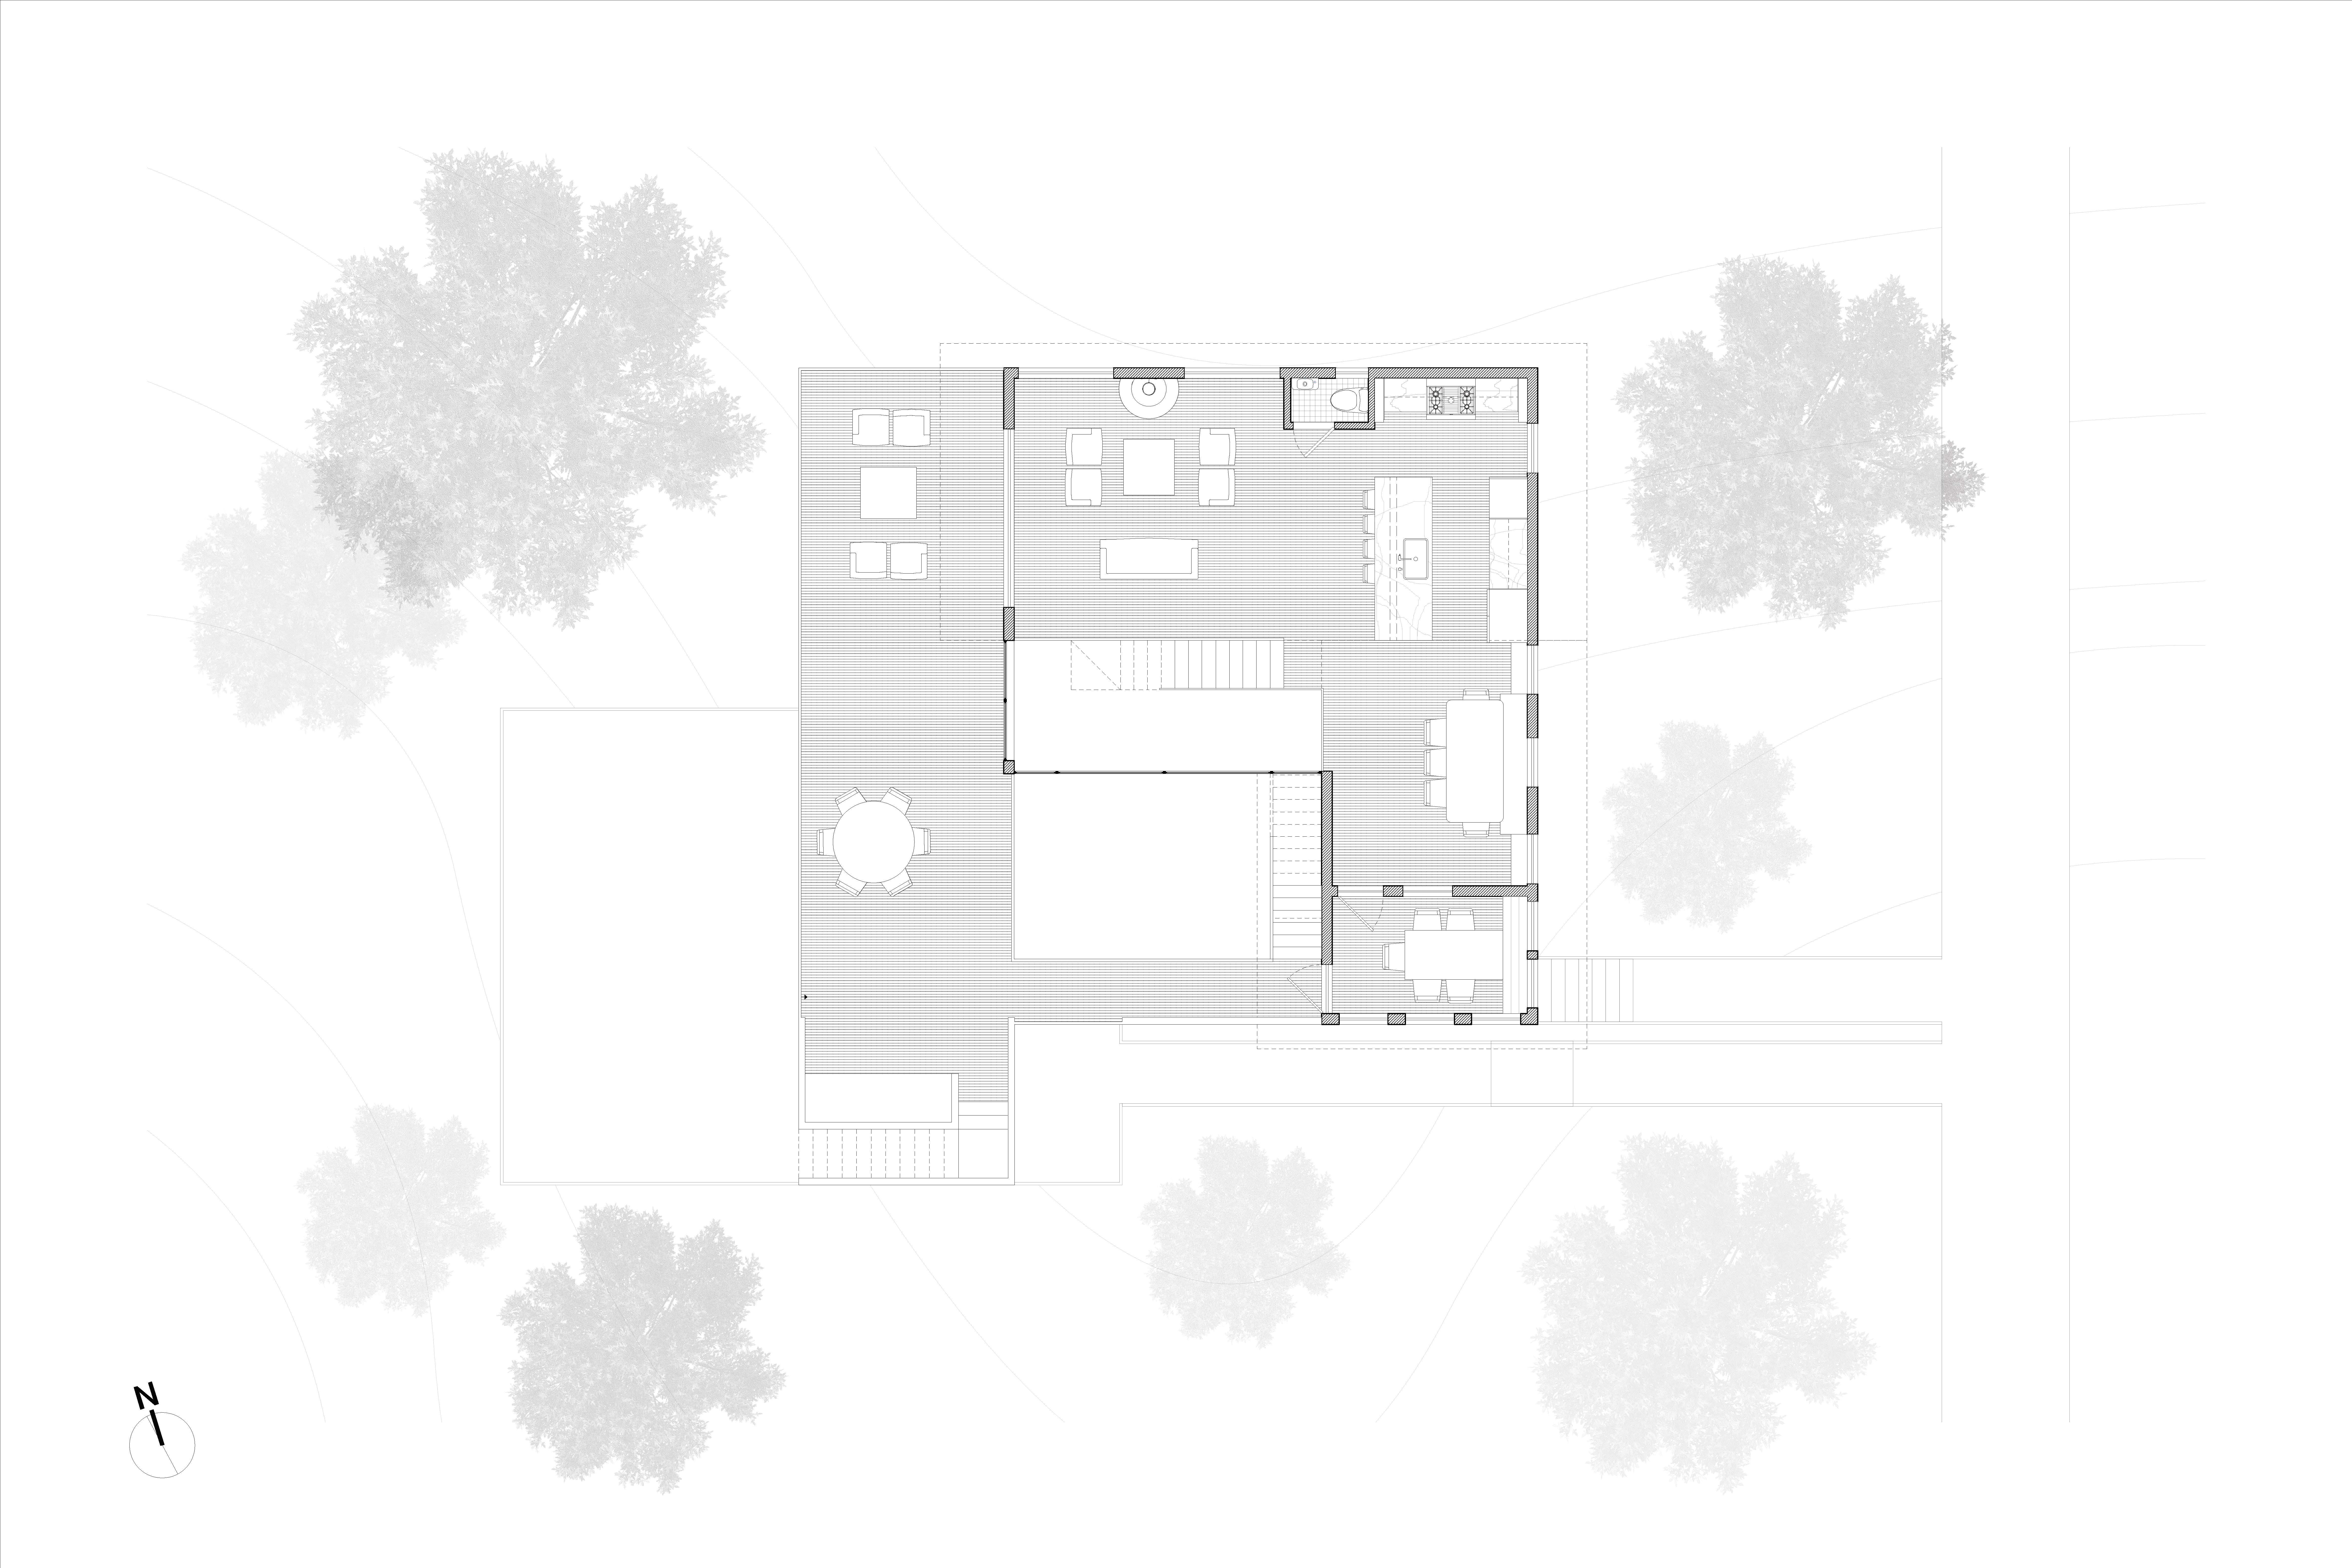 07_Second Floor Plan.jpg